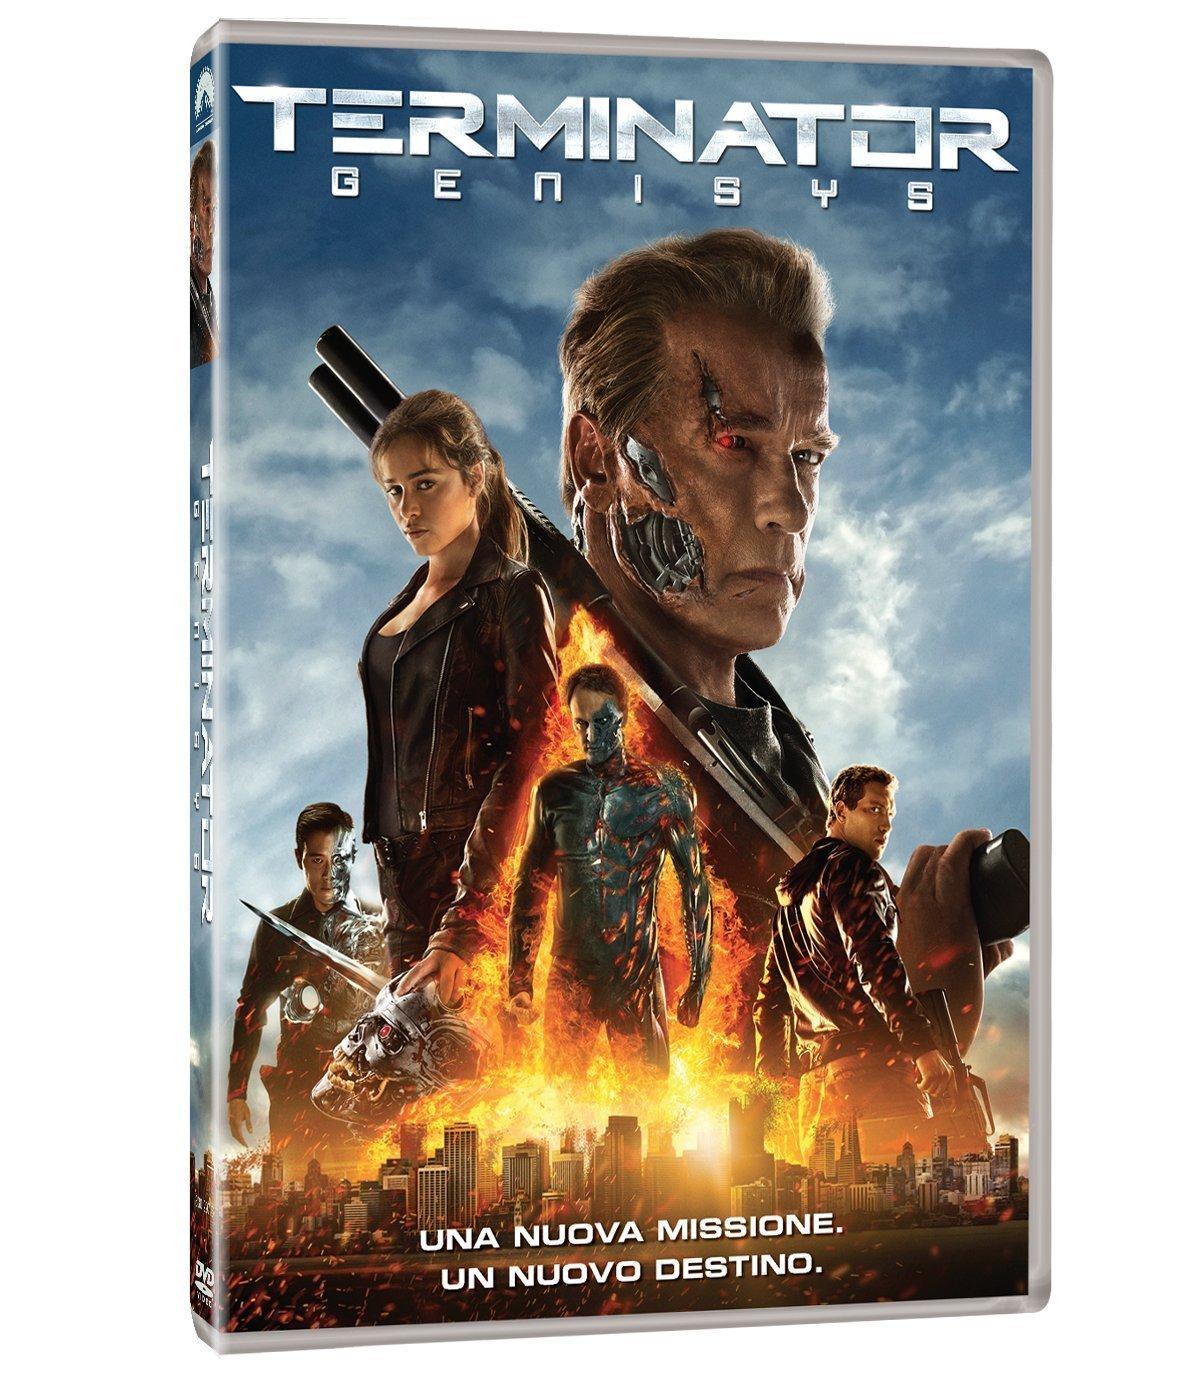 TERMINATOR - GENISYS (DVD)